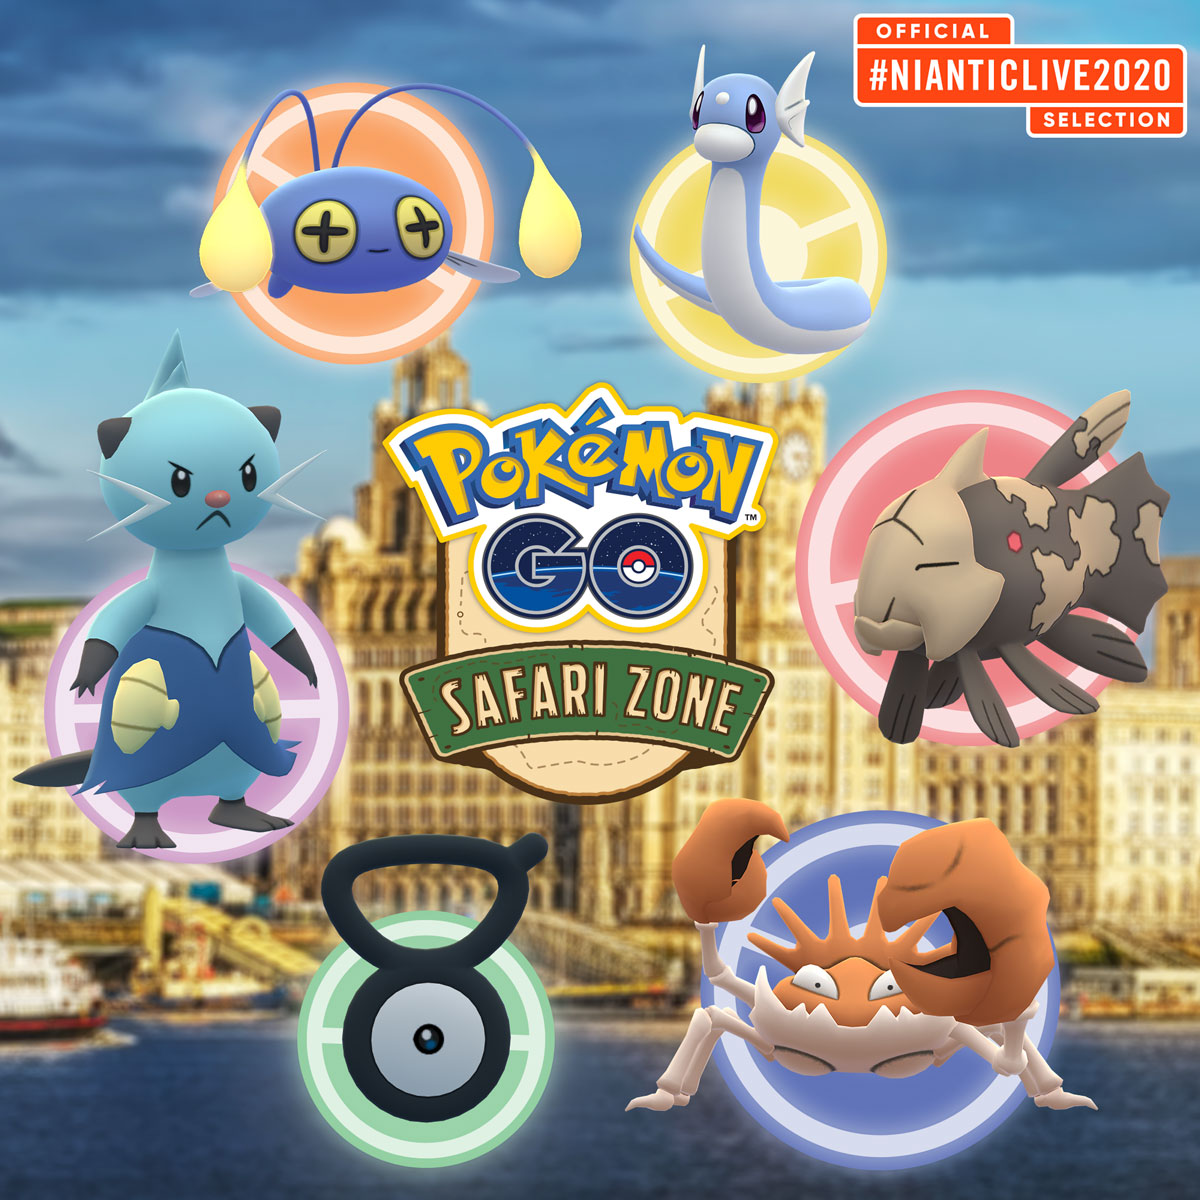 Pokémon GO for Liverpool!